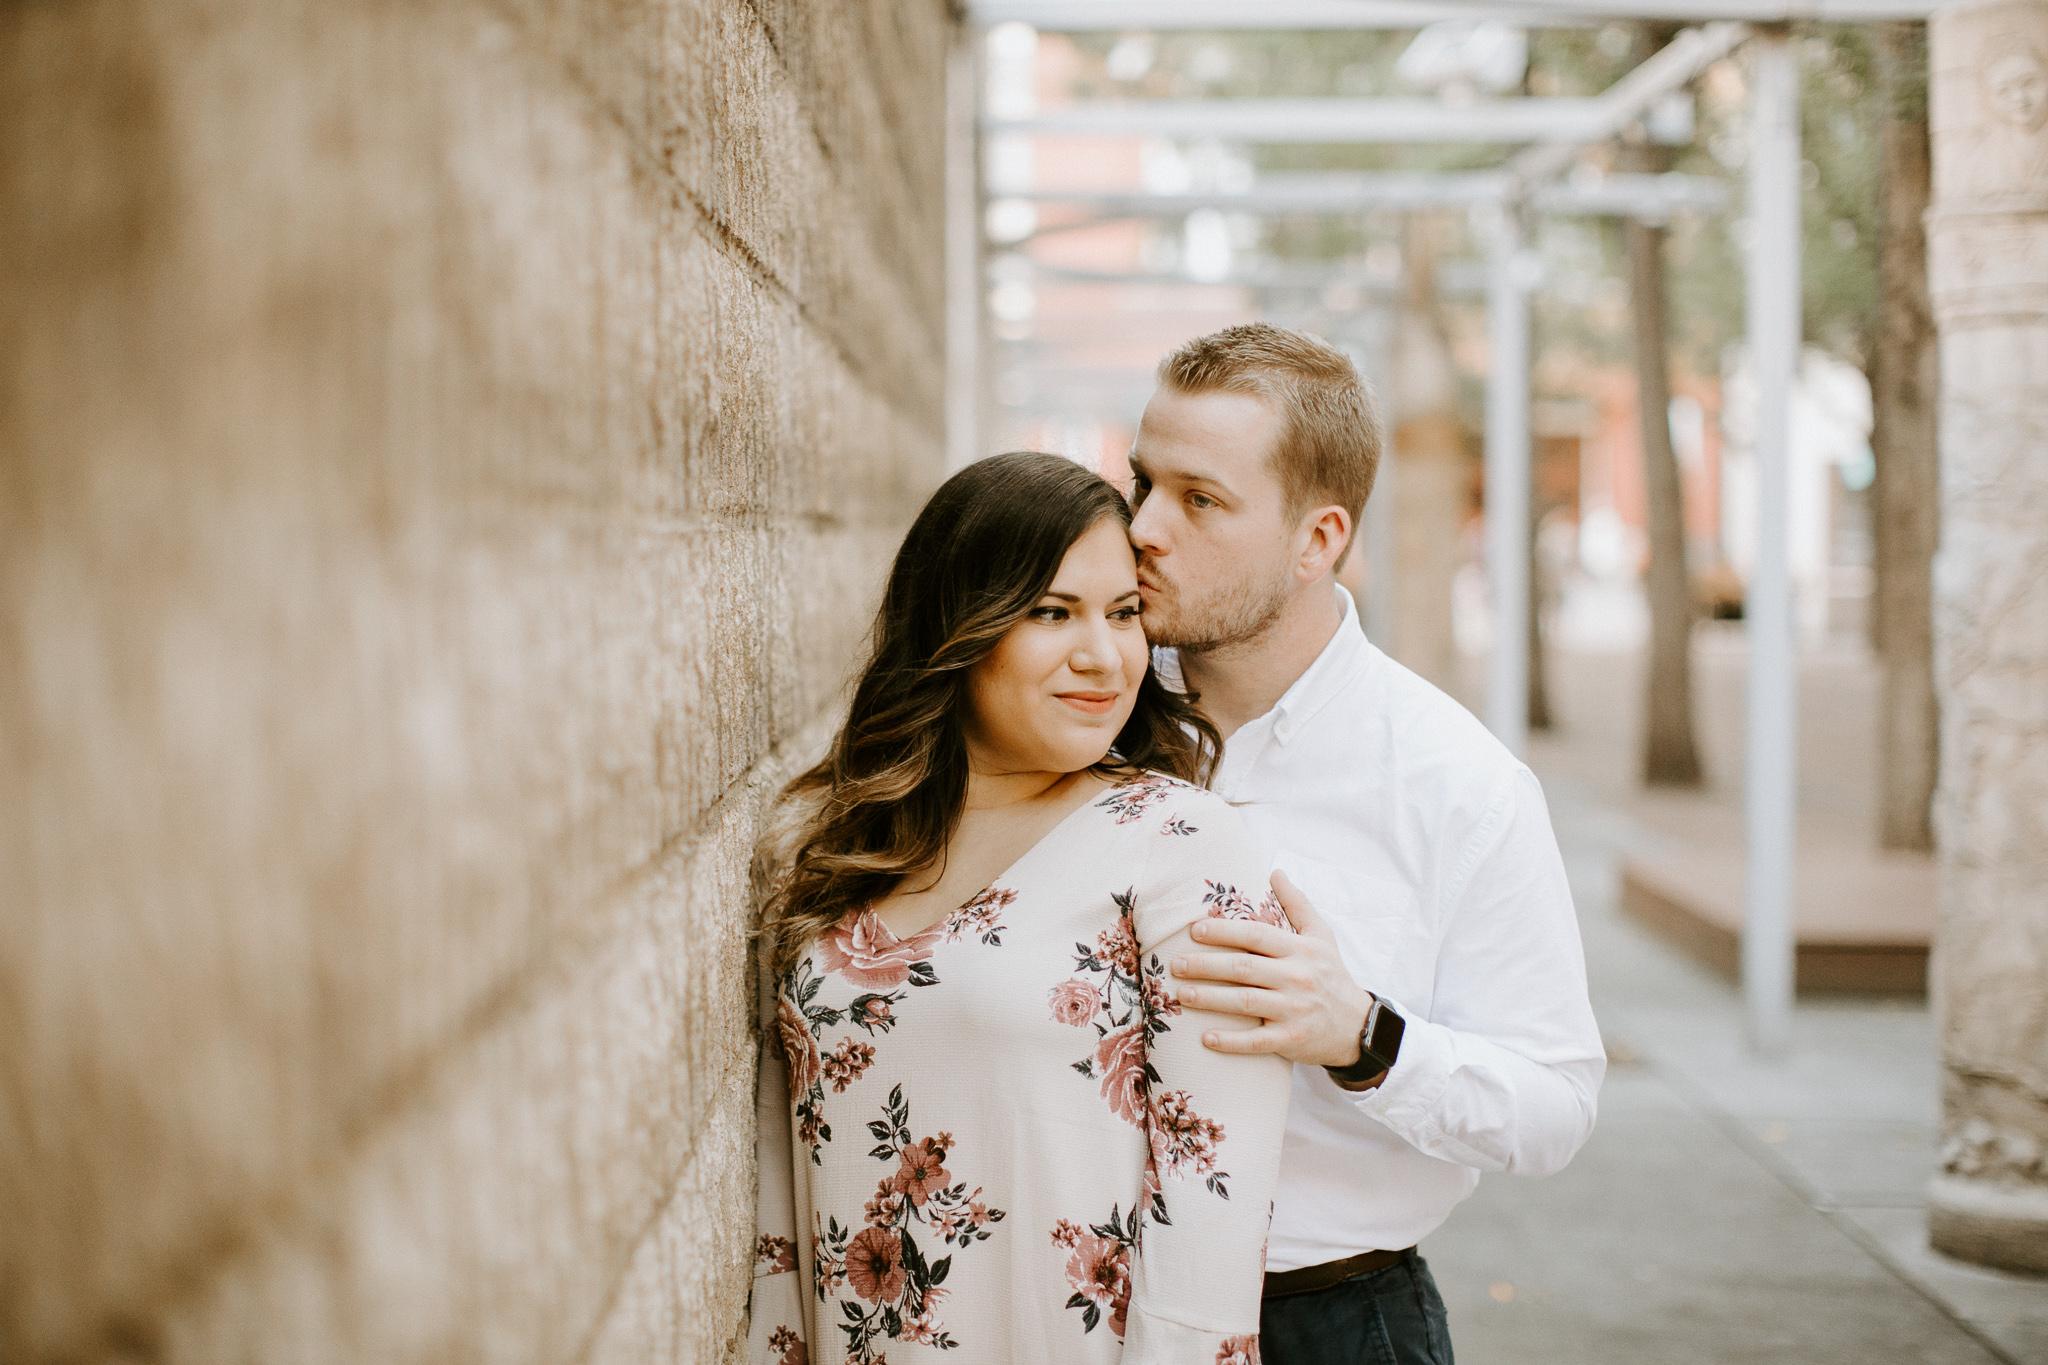 Engagement - Downtown Roanoke -  Wedding Photographer - Virginia - Best - Pat Cori Photography-10.jpg